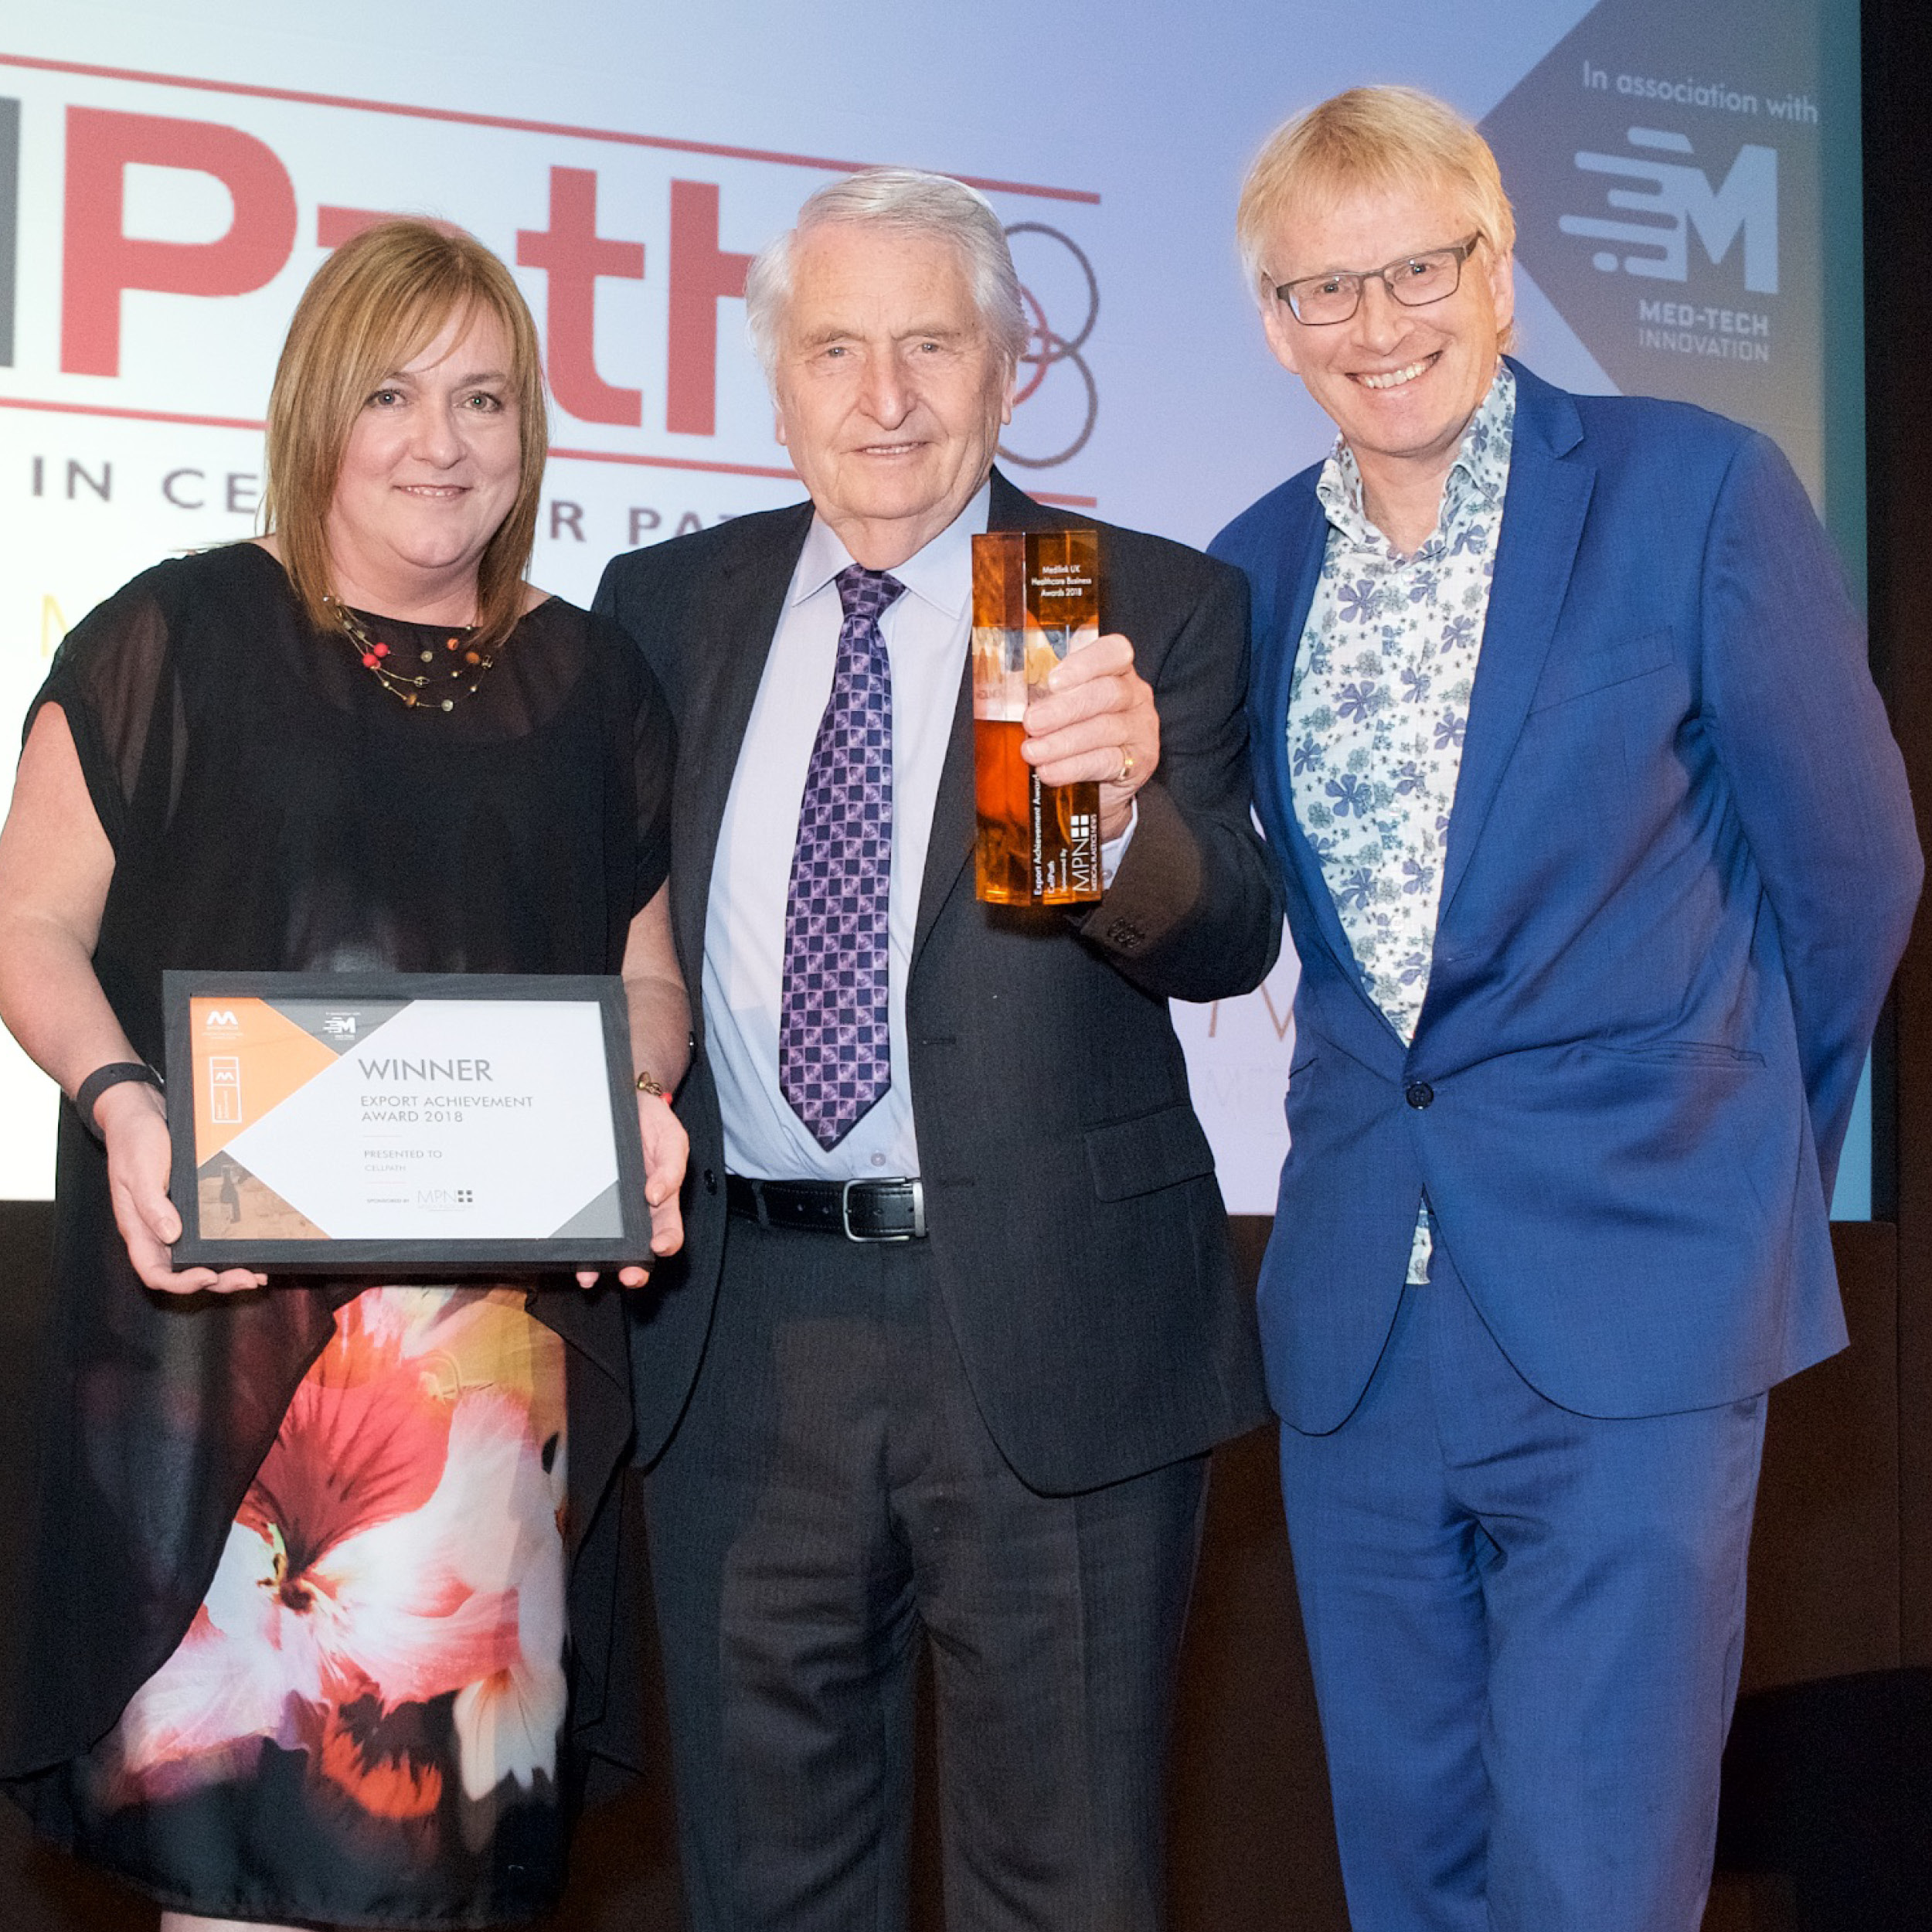 CellPath Toasts MediLink Awards Success